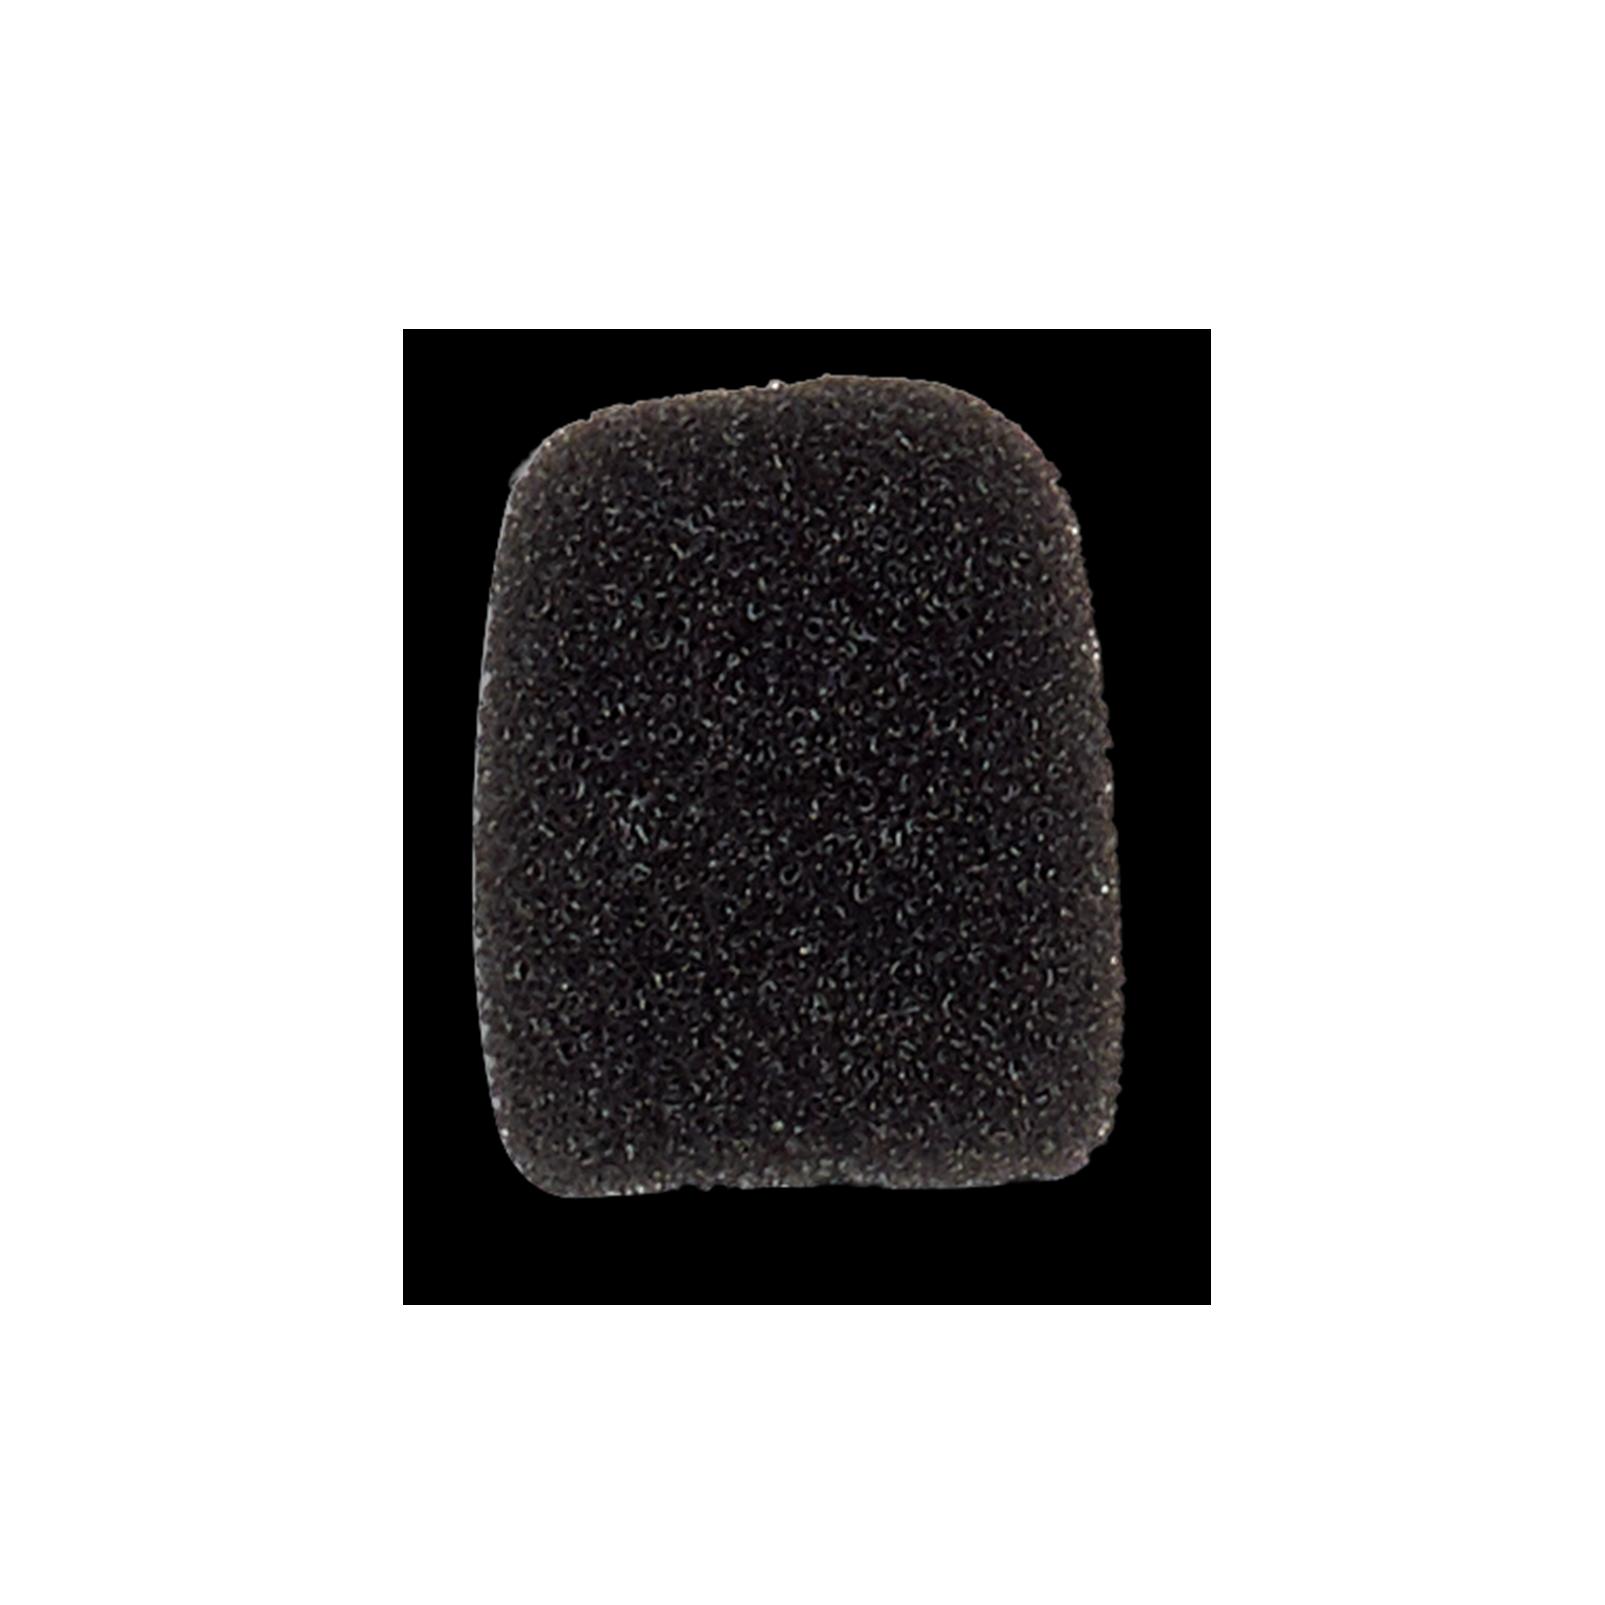 JBL Microphone sponge for Quantum ONE - Black - Wind cap - Hero